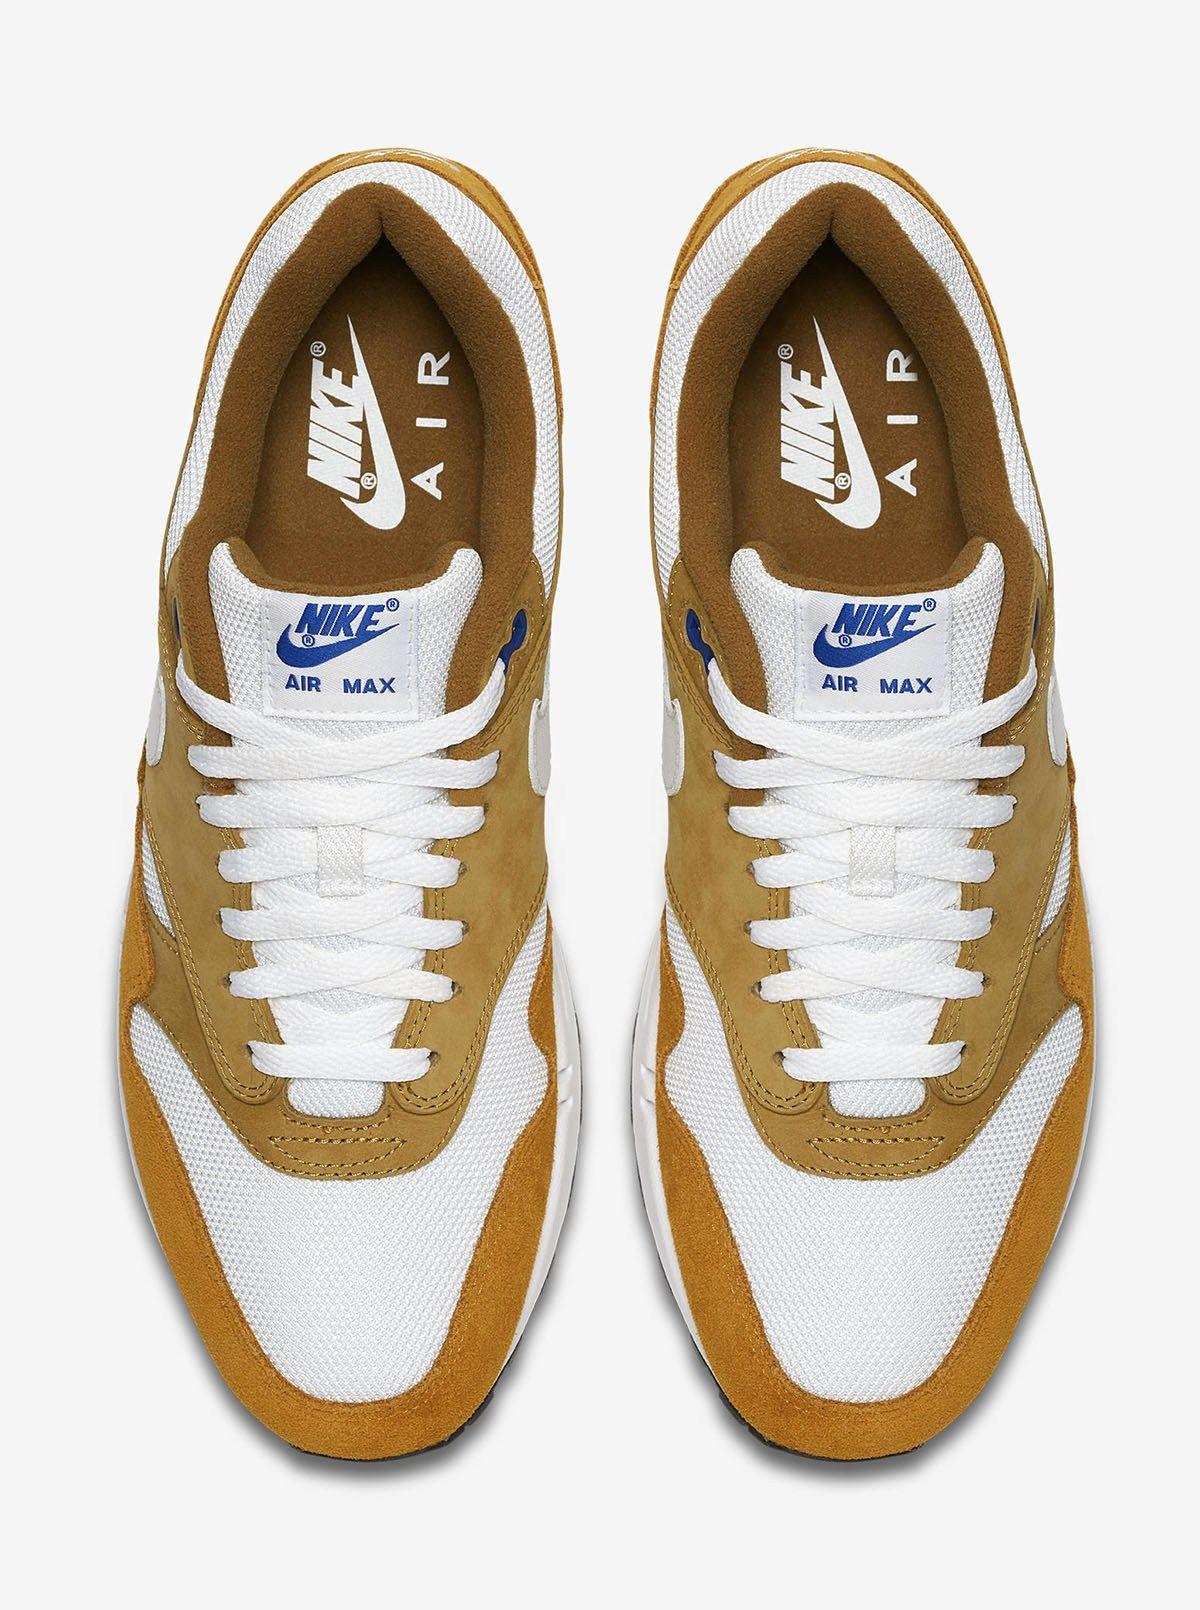 quality design 5b7a3 ee015 Nike Air Max 1 Premium Retro